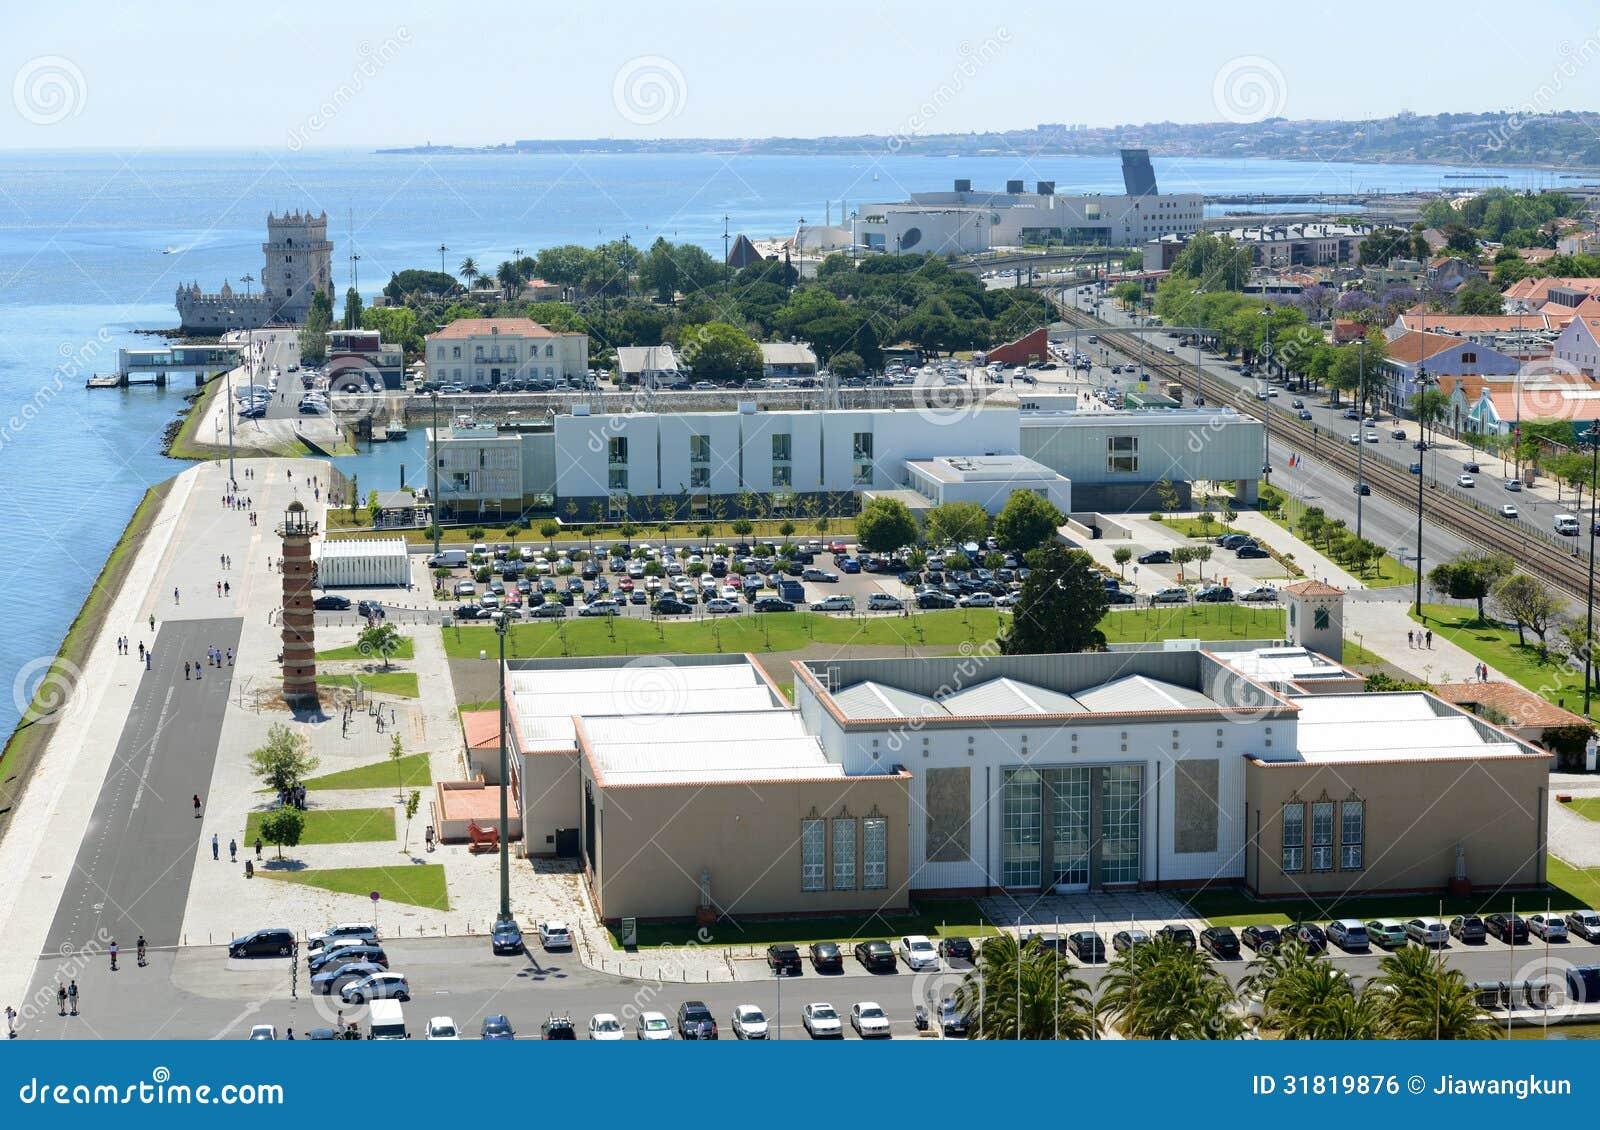 Belem Tower and Museu de Arte Popular, Lisbon, Portugal